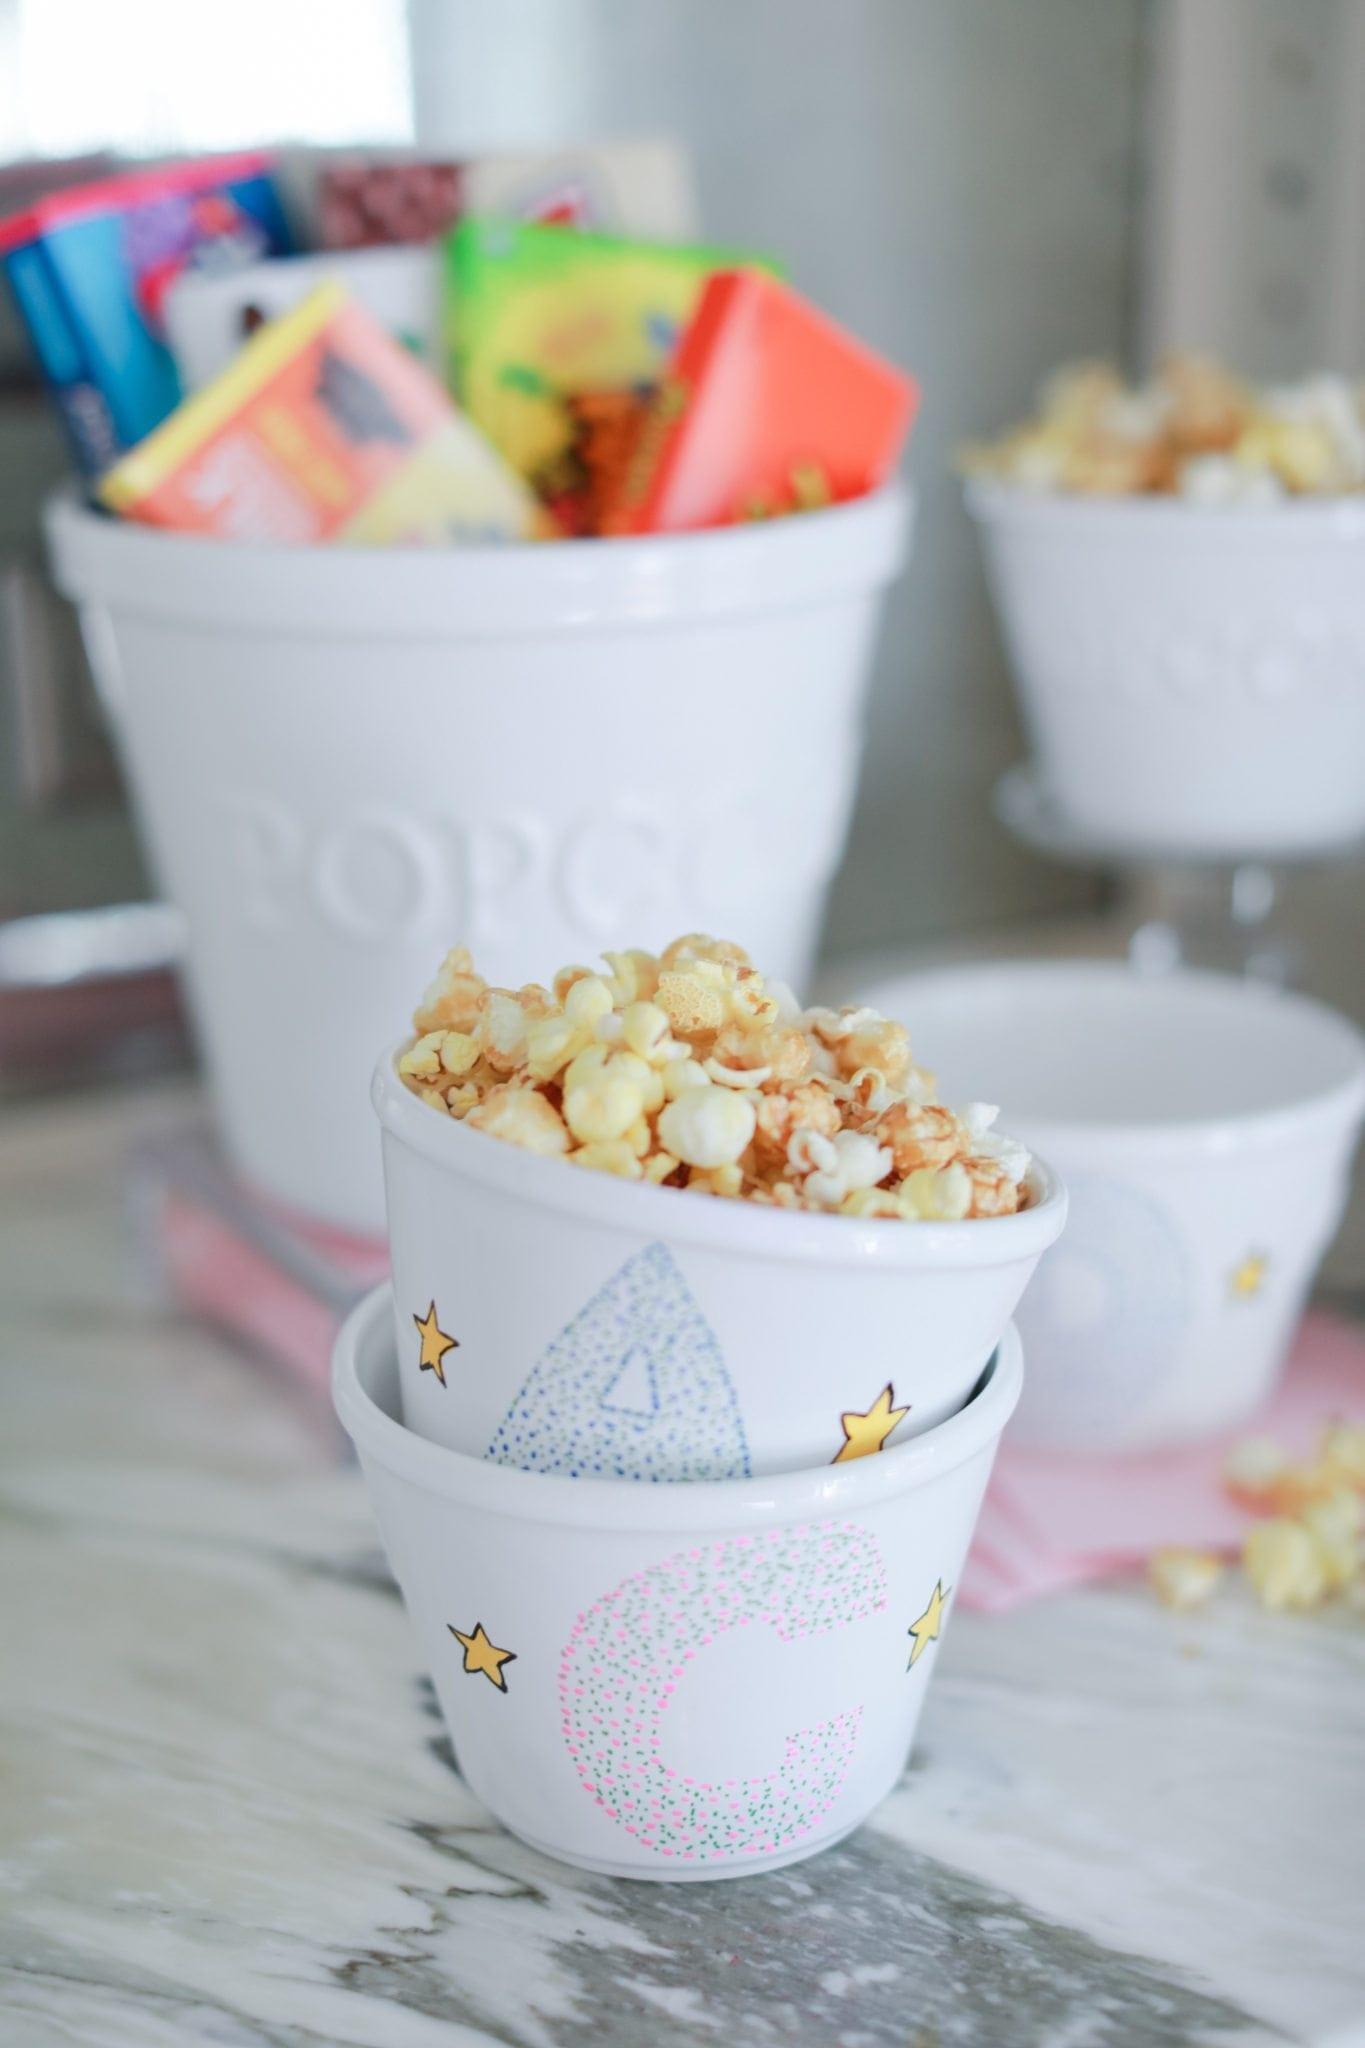 Personalized popcorn bowls.